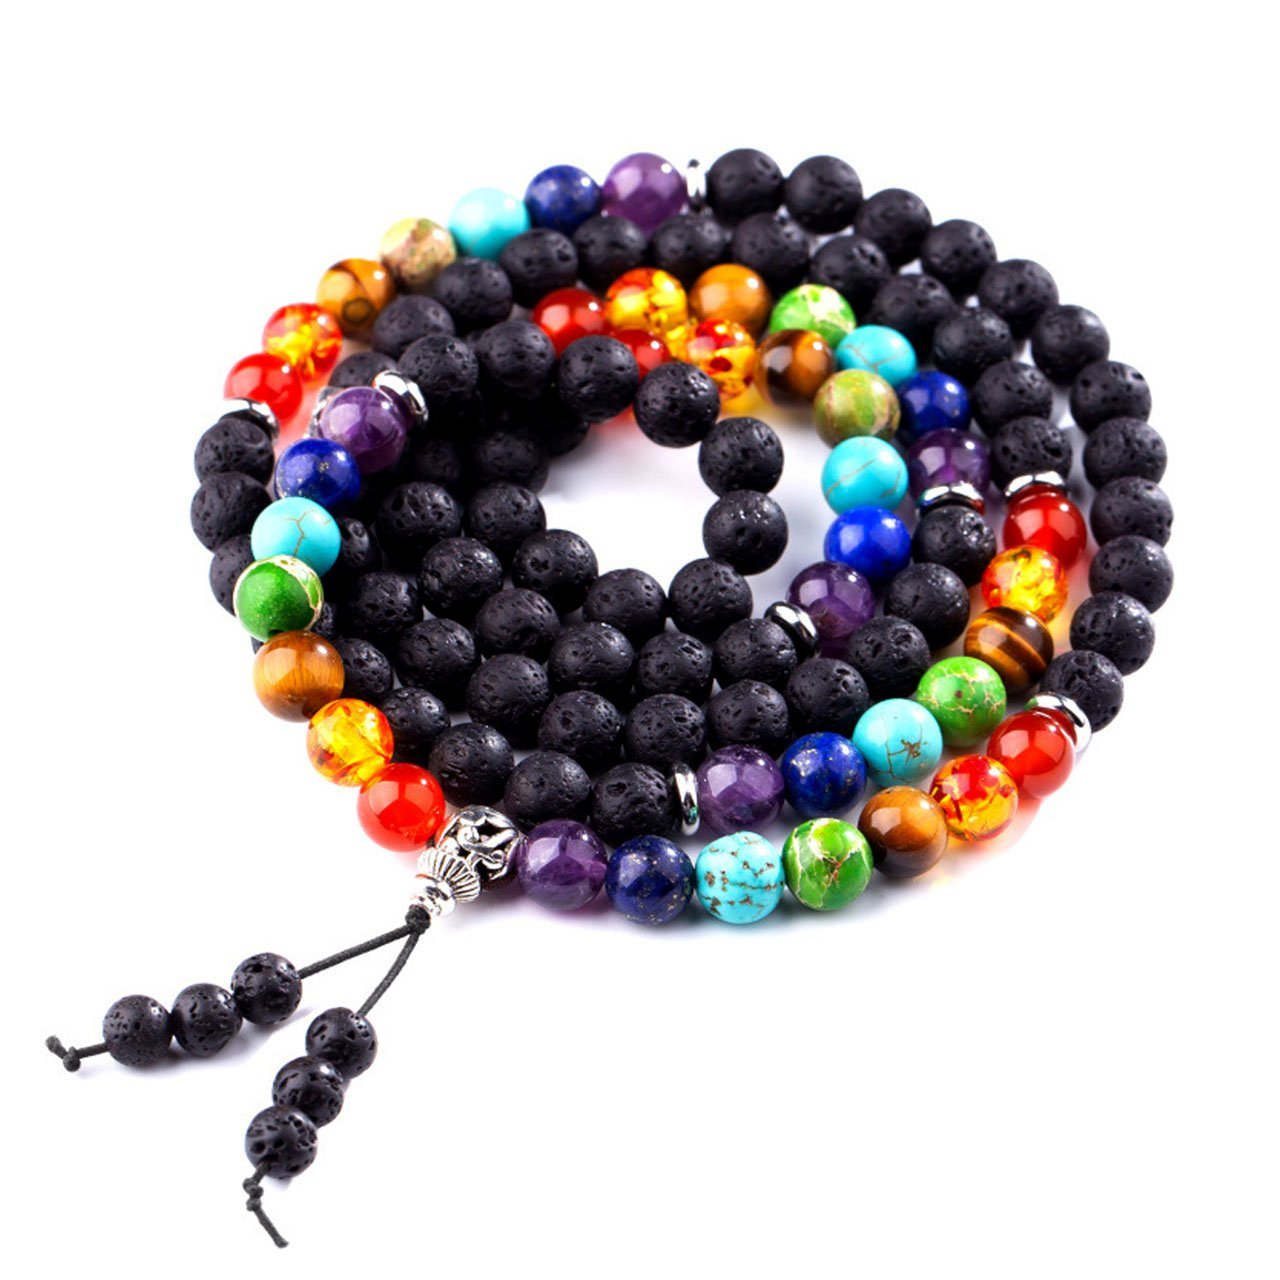 Domika 6mm Lava Rock Stone 7 Chakra Healing Crystal Beads Meditation Bracelet with Tree of Life Charm (Multi color 8mm)